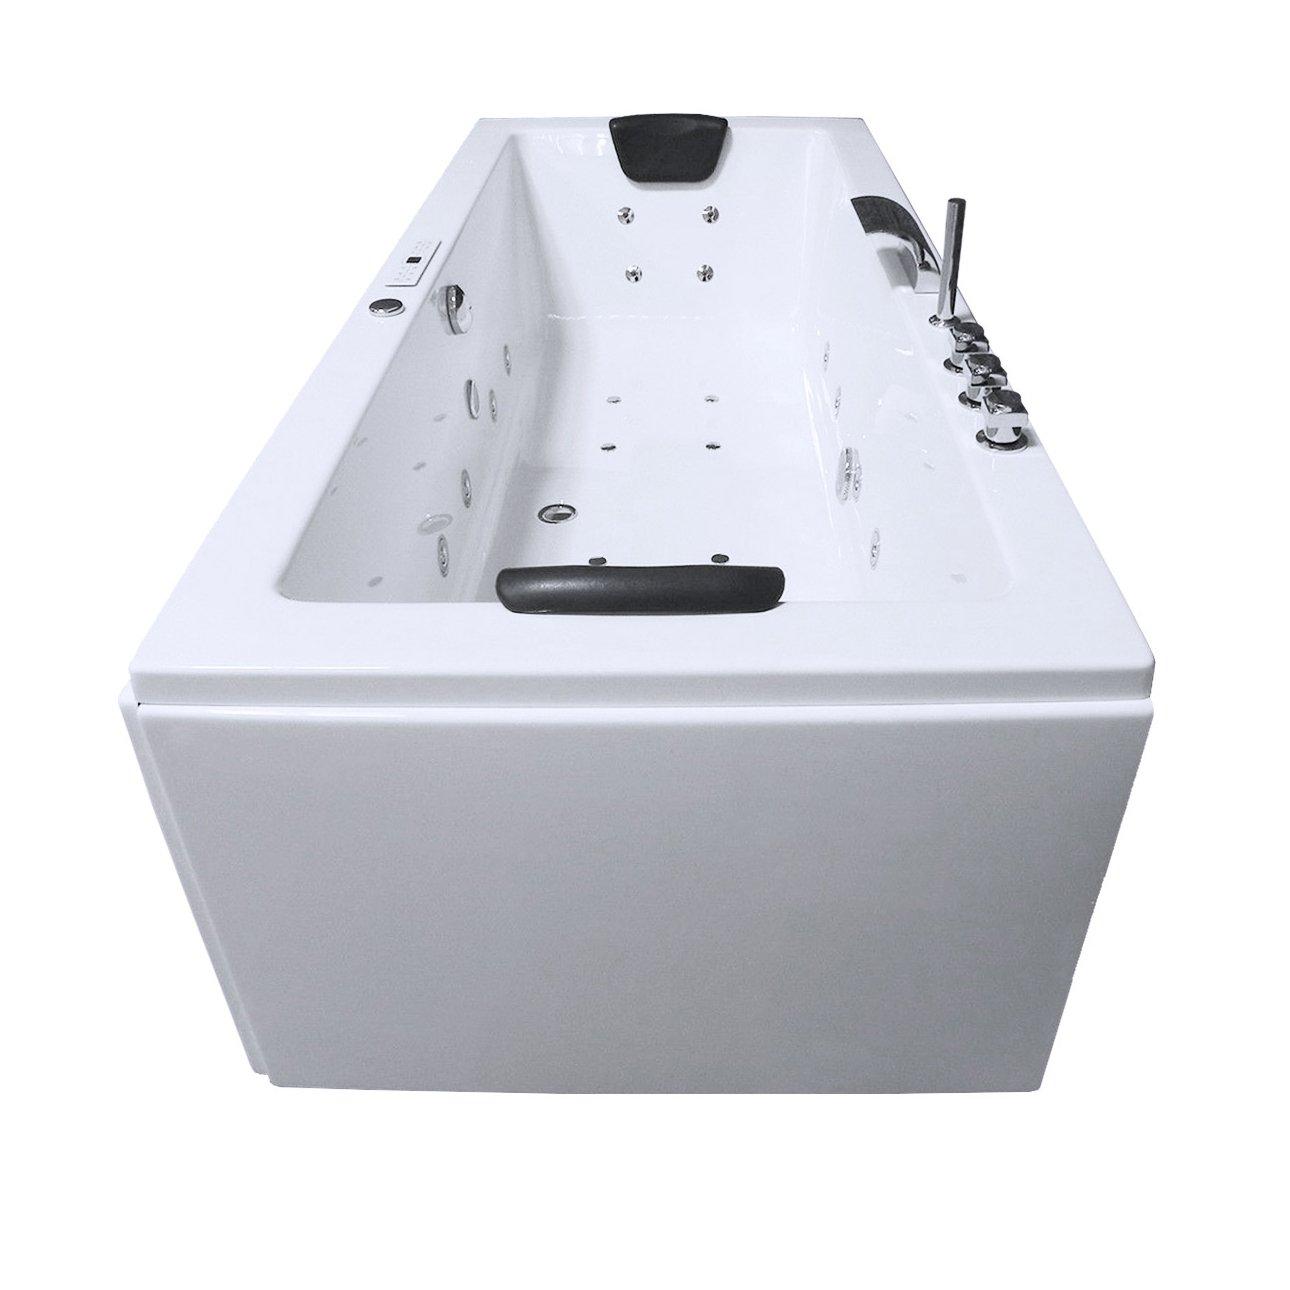 Whirlpool Badewanne Rechteck - Rü gen Premium 2 Personen Whirlwanne Indoor NEU (180x90x62 cm) Vilanaa